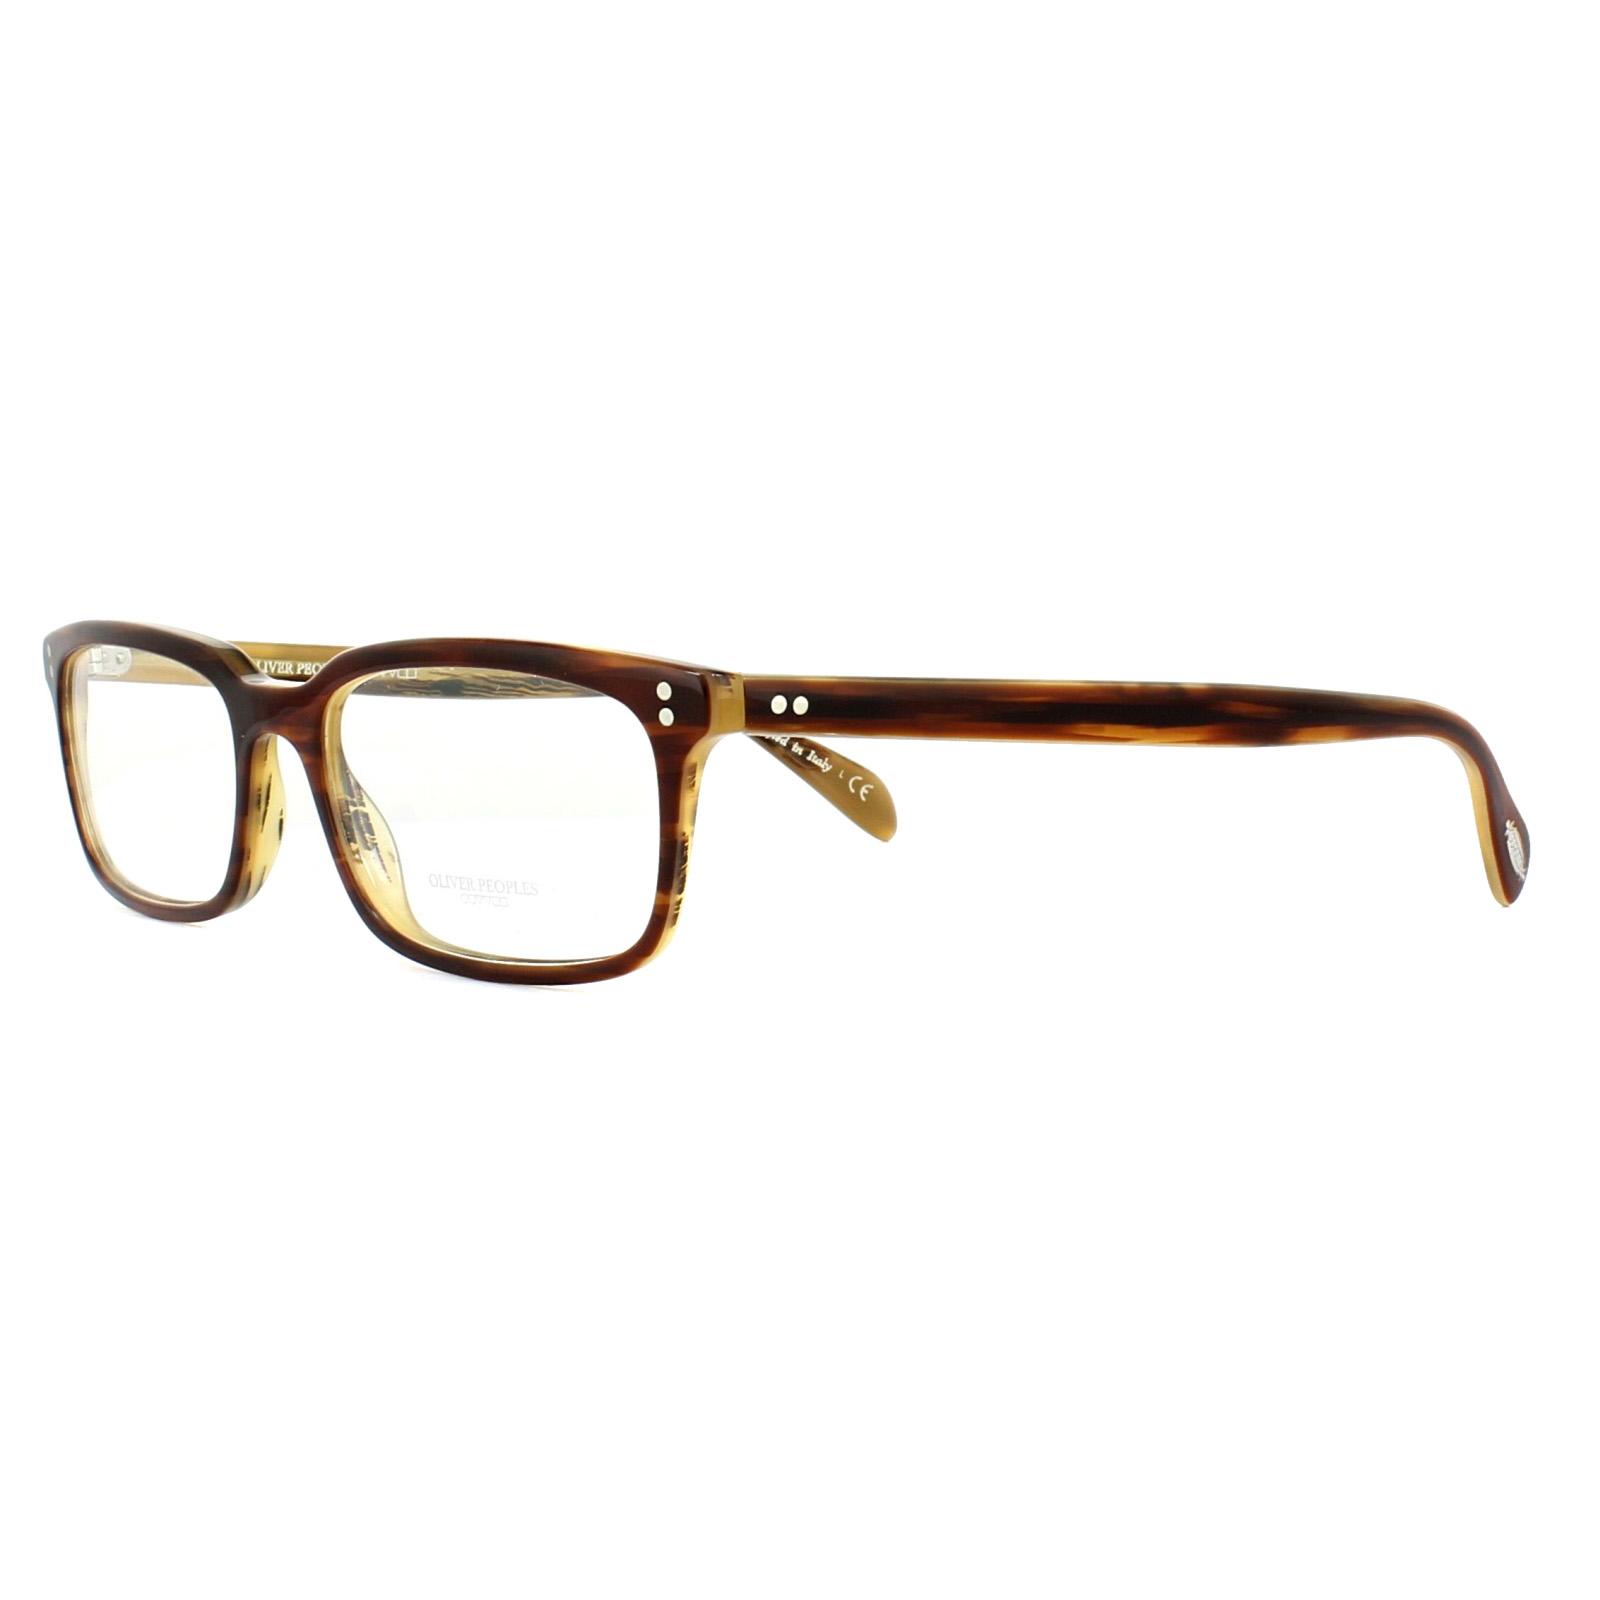 840d7b3471 Sentinel Oliver Peoples Glasses Frames OV5102 1310 Matt Black 51mm Mens